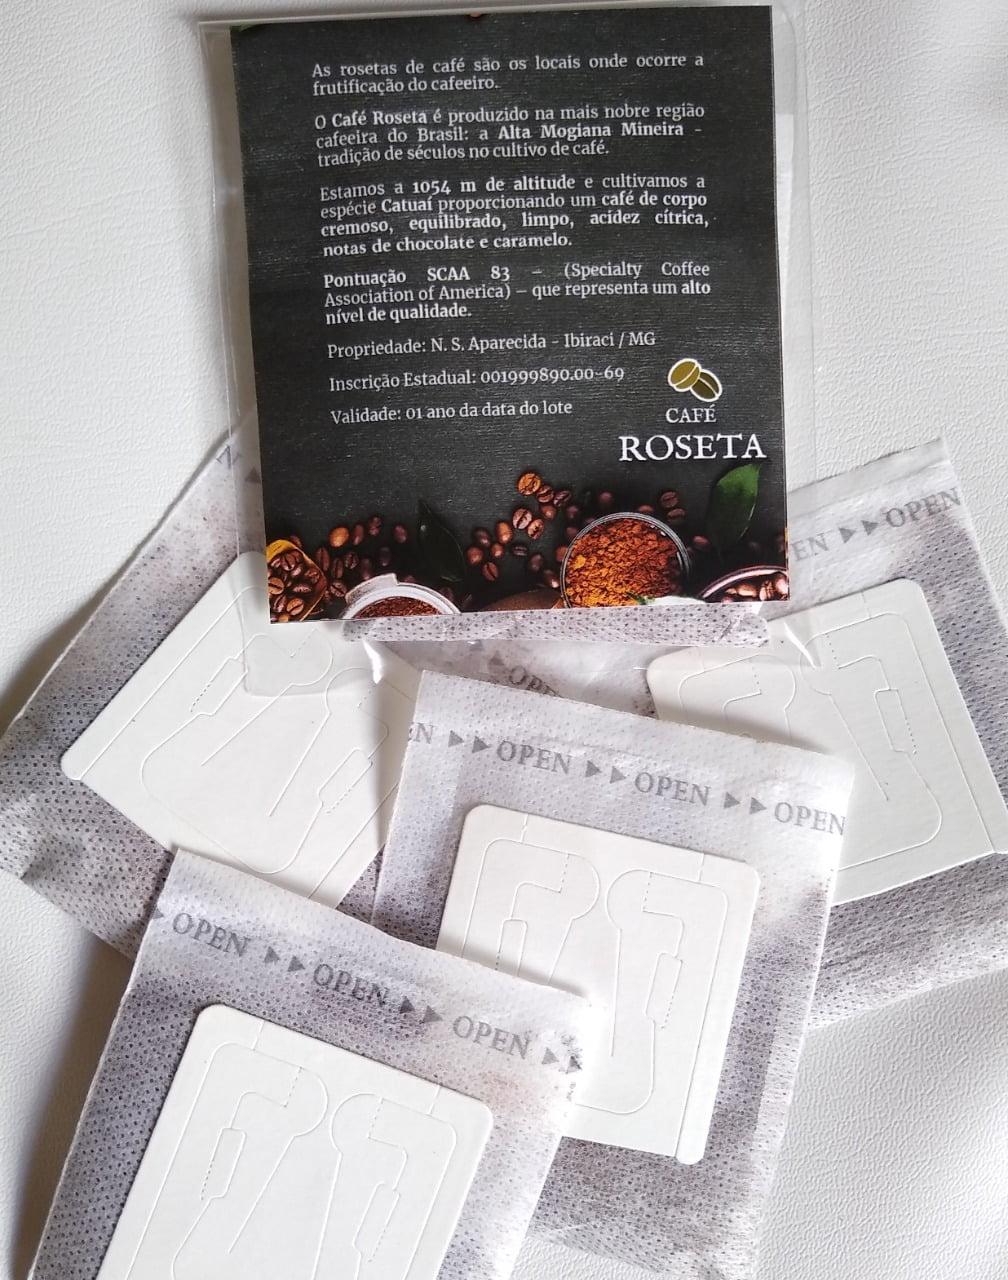 Drip Coffee Café Roseta Especial - 83 pts Alta Mogiana - cx 10 un